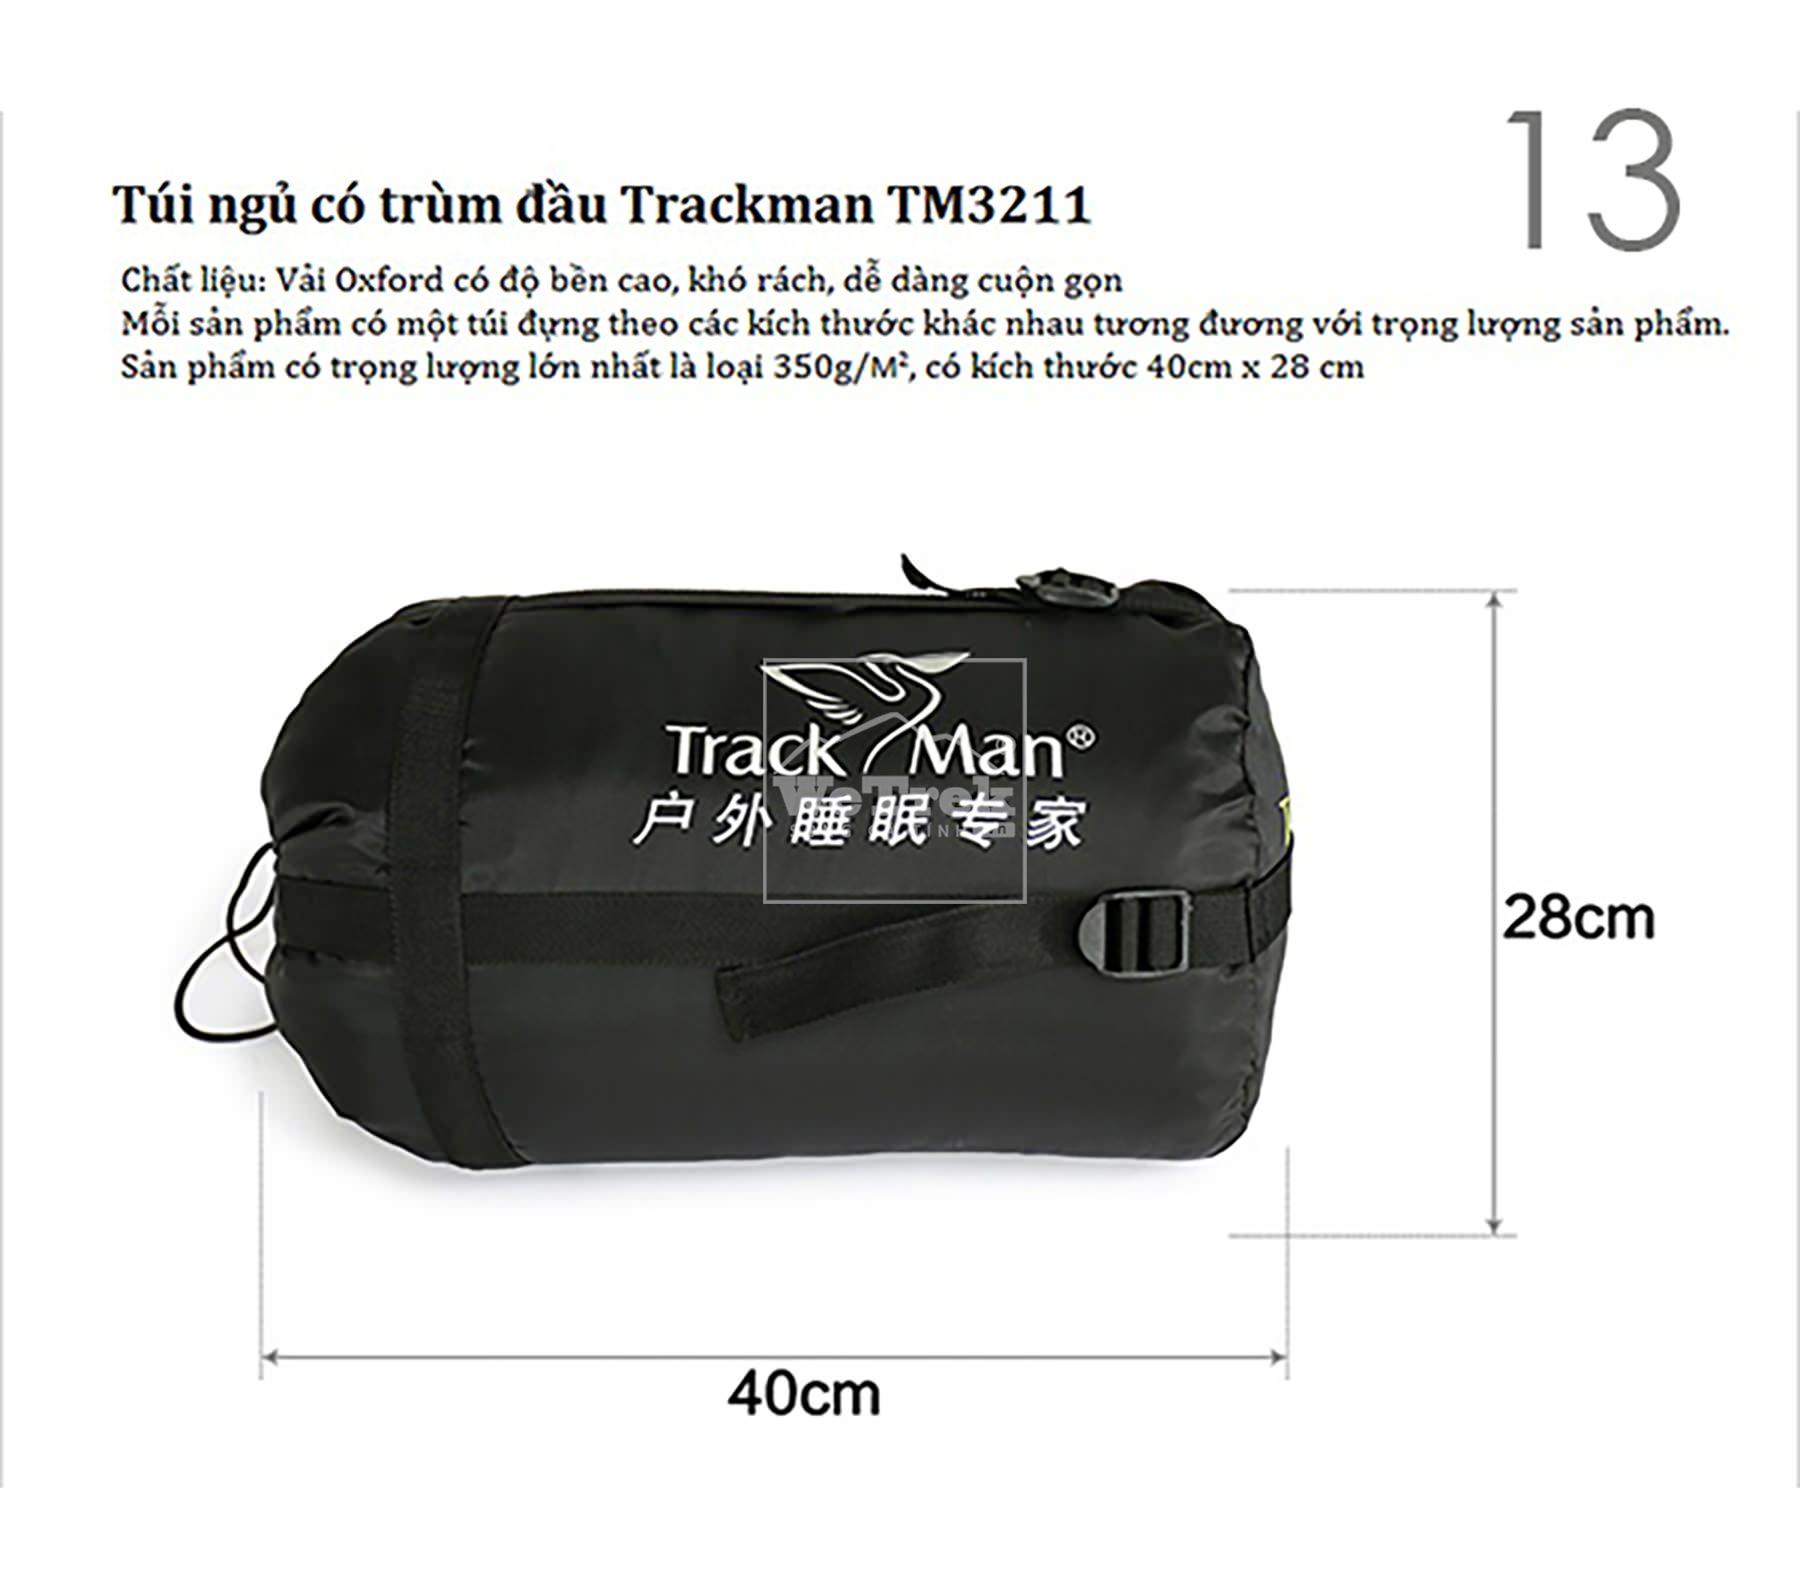 Tui-ngu-du-lich-Track-Man-co-trum-dau-TM3211-350-gram-2.jpg